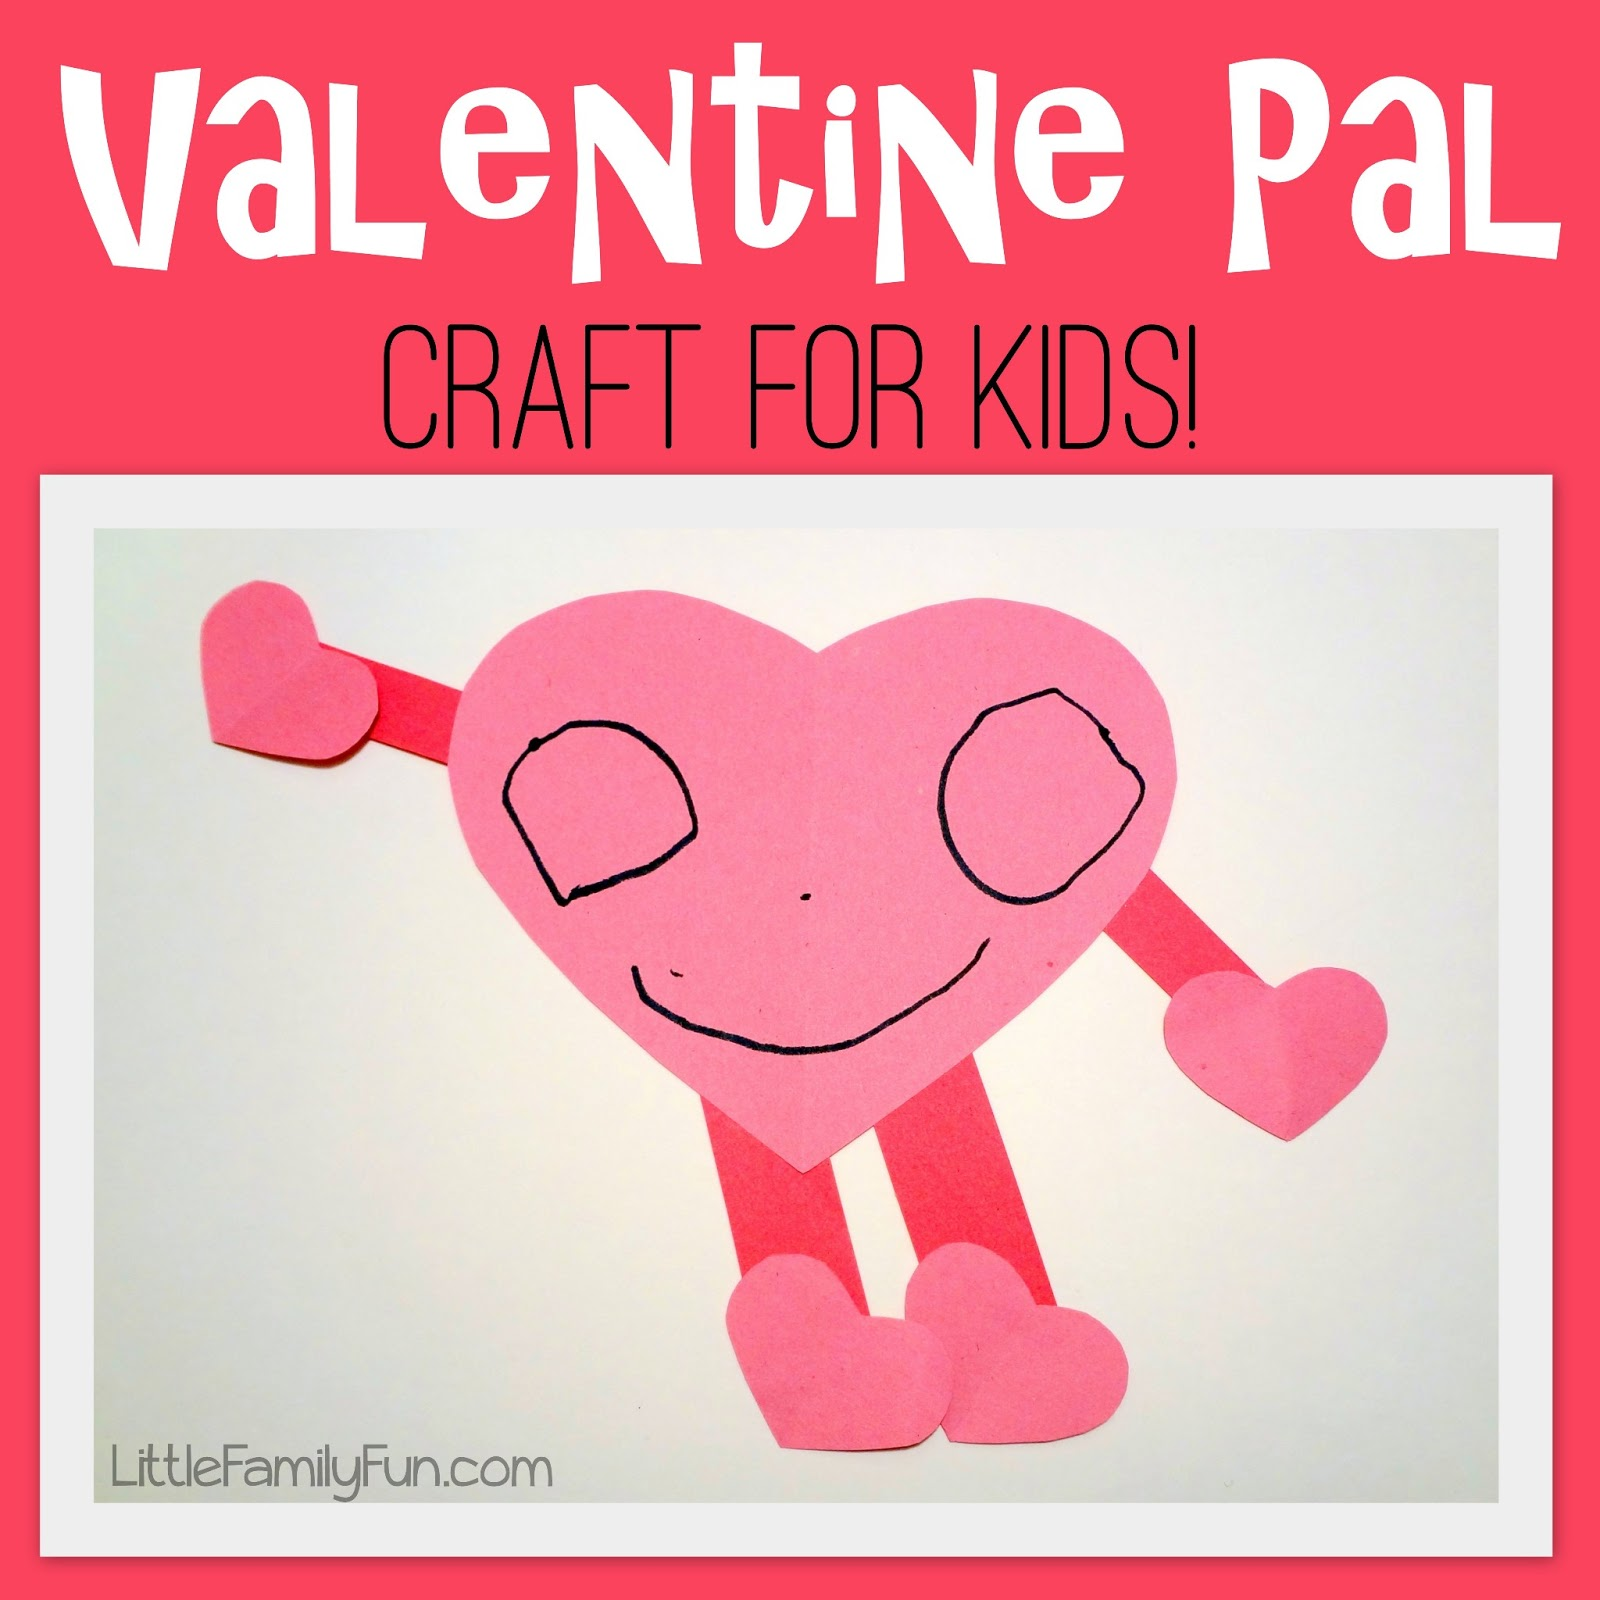 Valentine Pal Craft For Kids